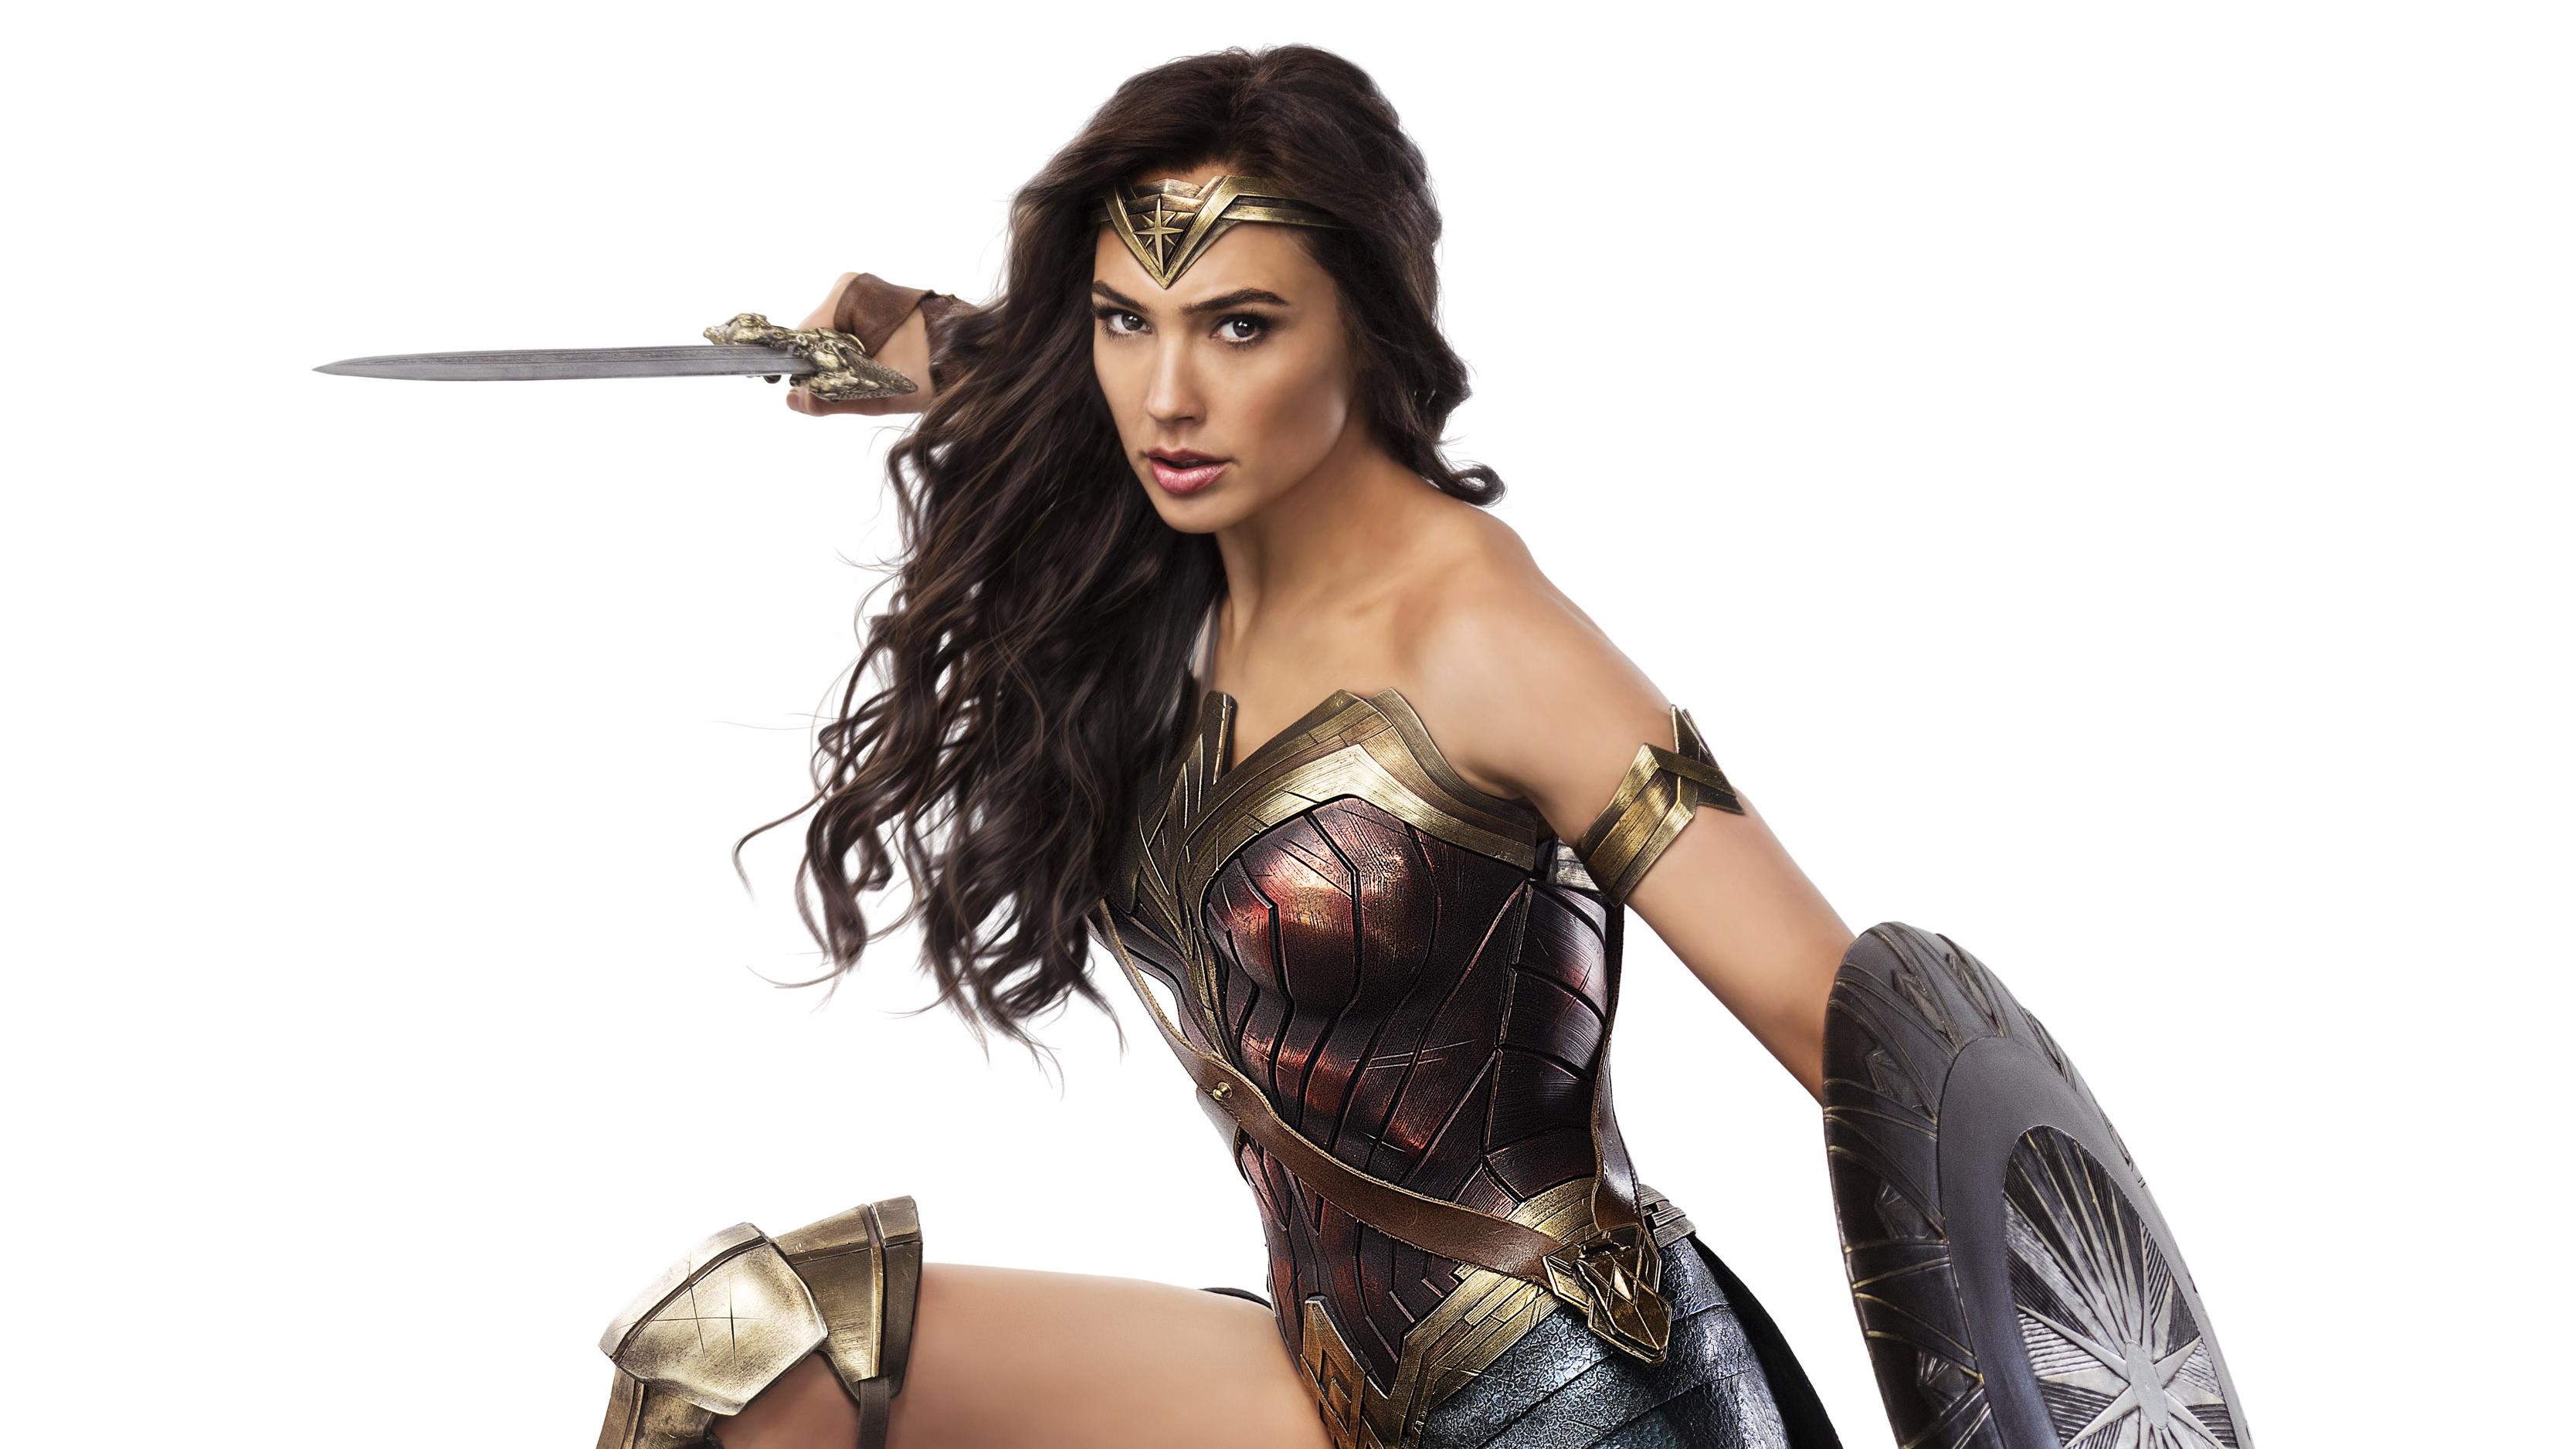 Gal Gadot Wonder Woman New 4k Hd Movies 4k Wallpapers: Wonder Woman Gal Gadot 4k, HD Superheroes, 4k Wallpapers